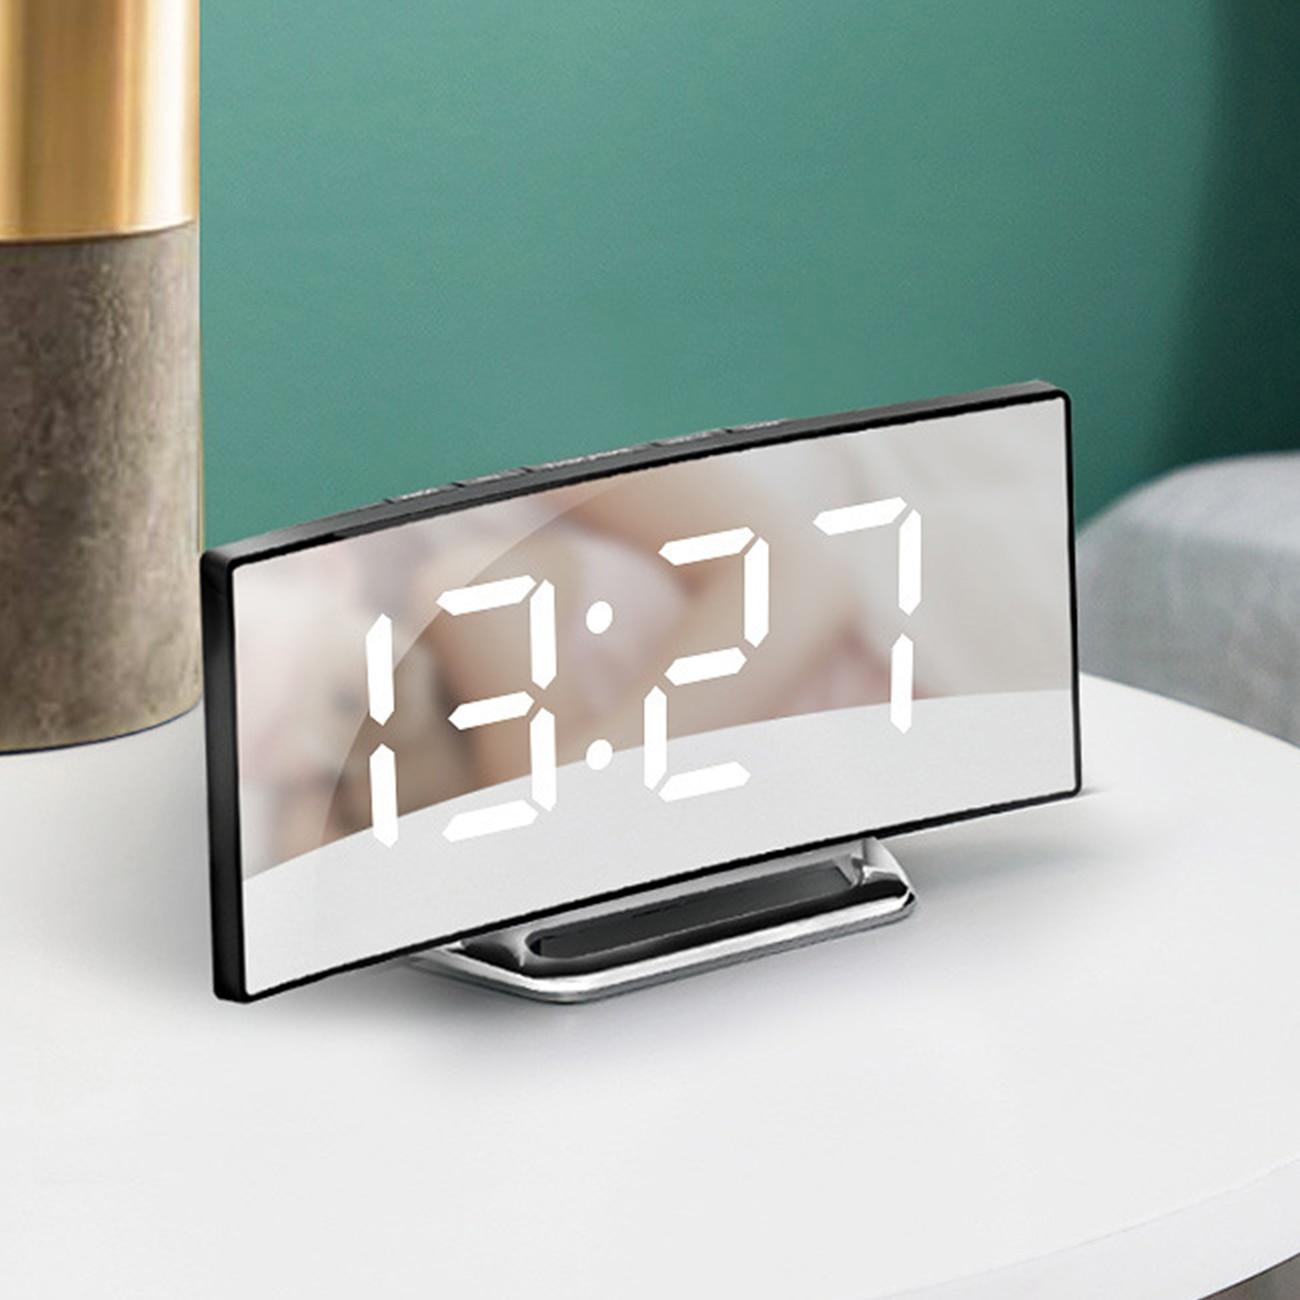 Digital Alarm Clock  Mirror Curved Dimmable Led Electronic Desktop For Kids Bedroom Living Room Home Decor